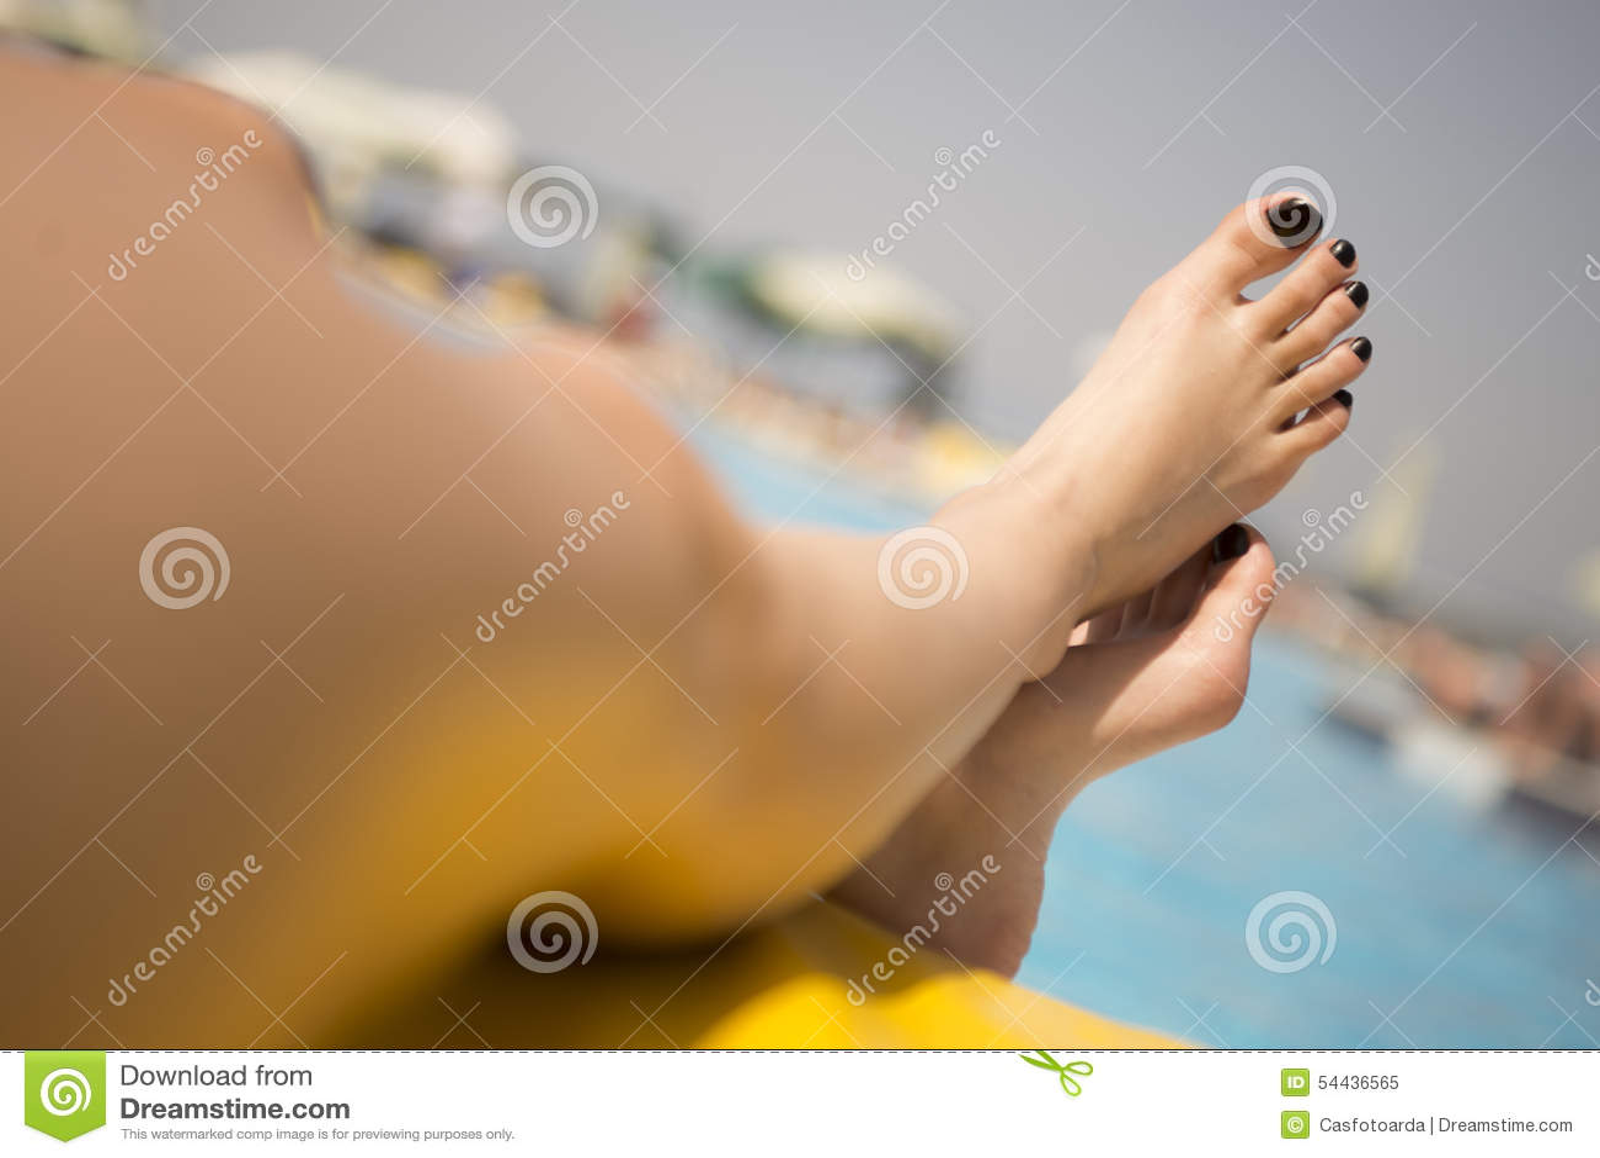 Sexy feet with black nail polish